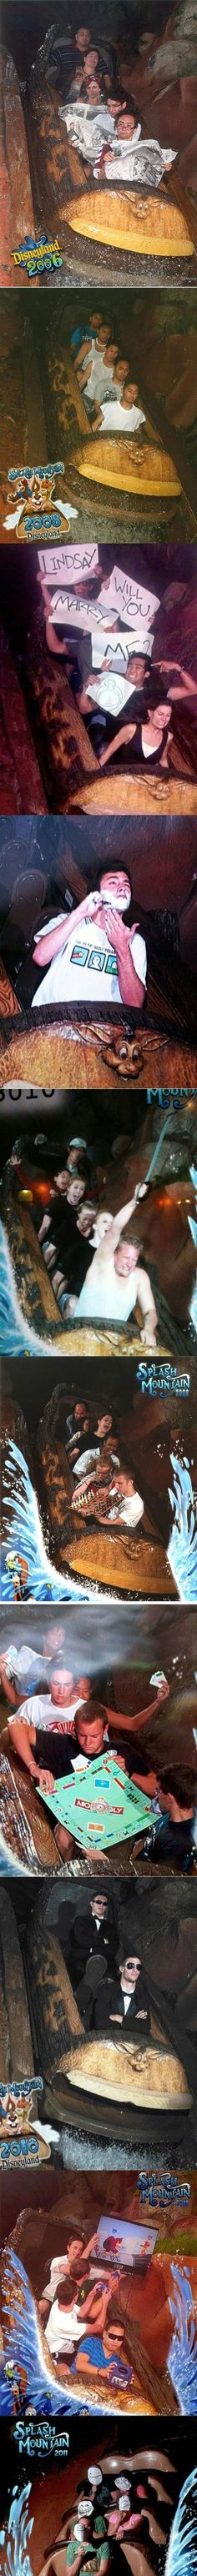 Best of Disneyland's Splash Mountain...I love the marriage proposal <3